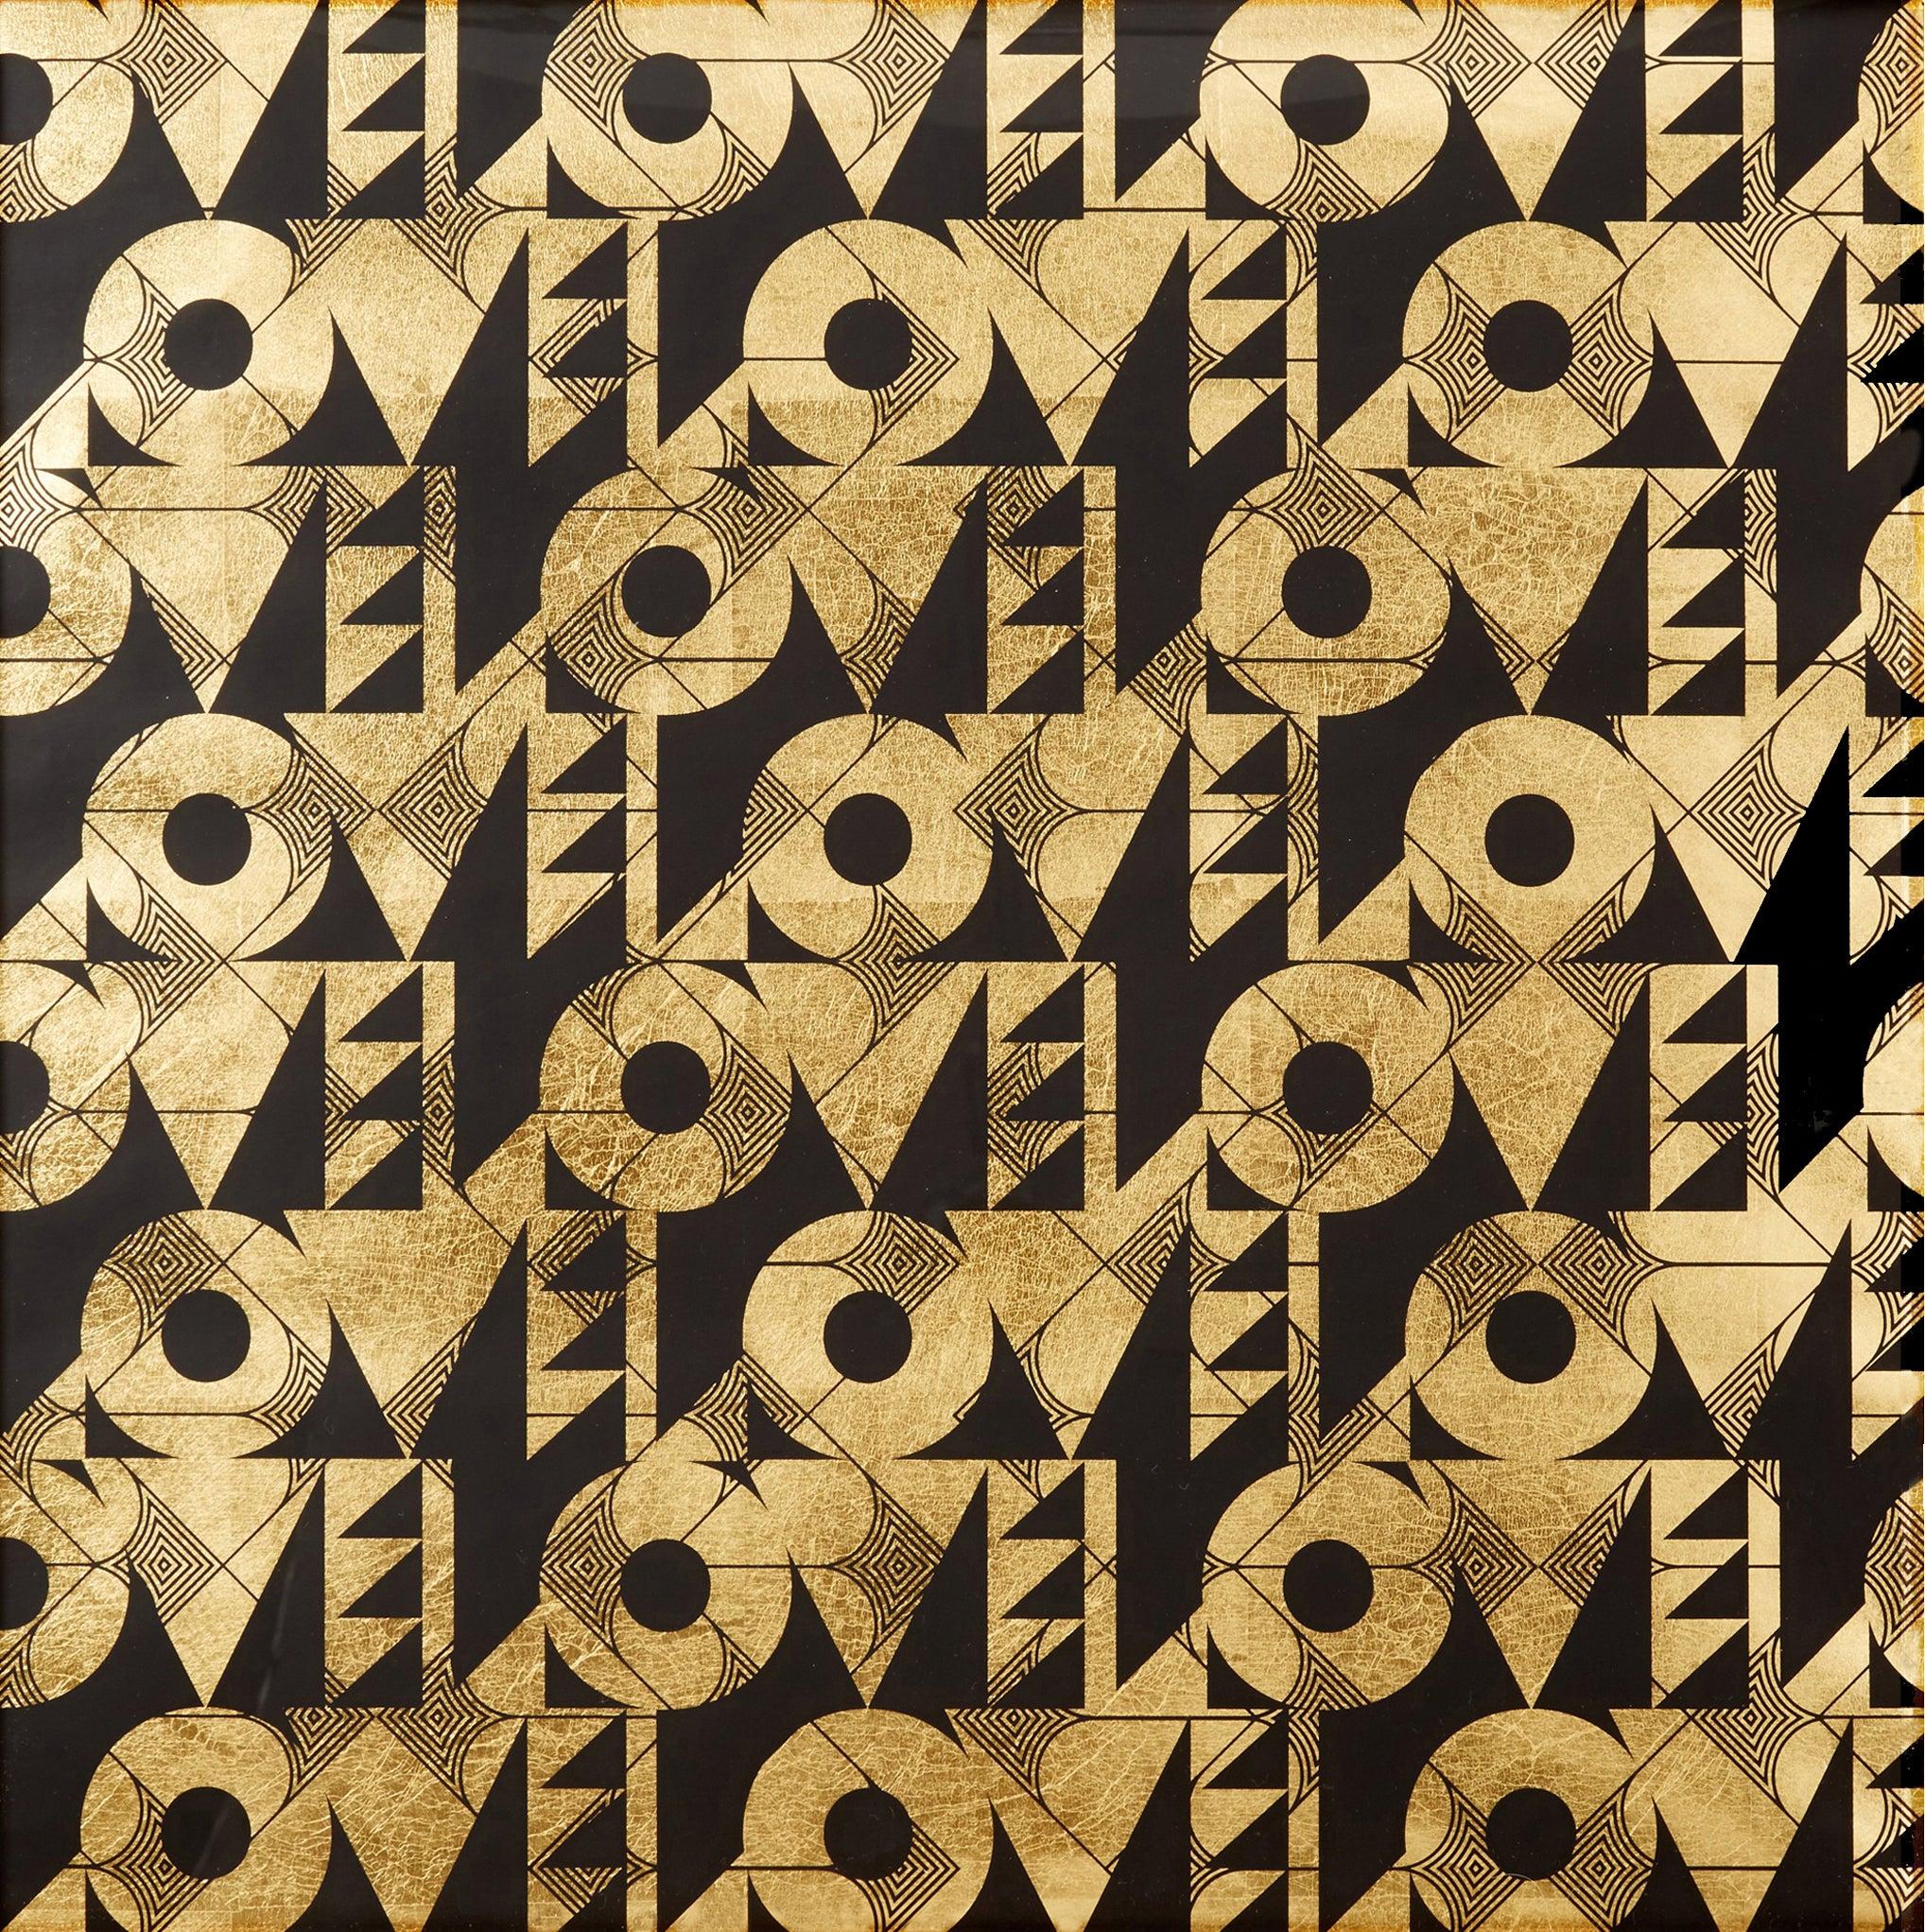 Love and Arrows (design gold black metallic work on paper patterns Art Deco)